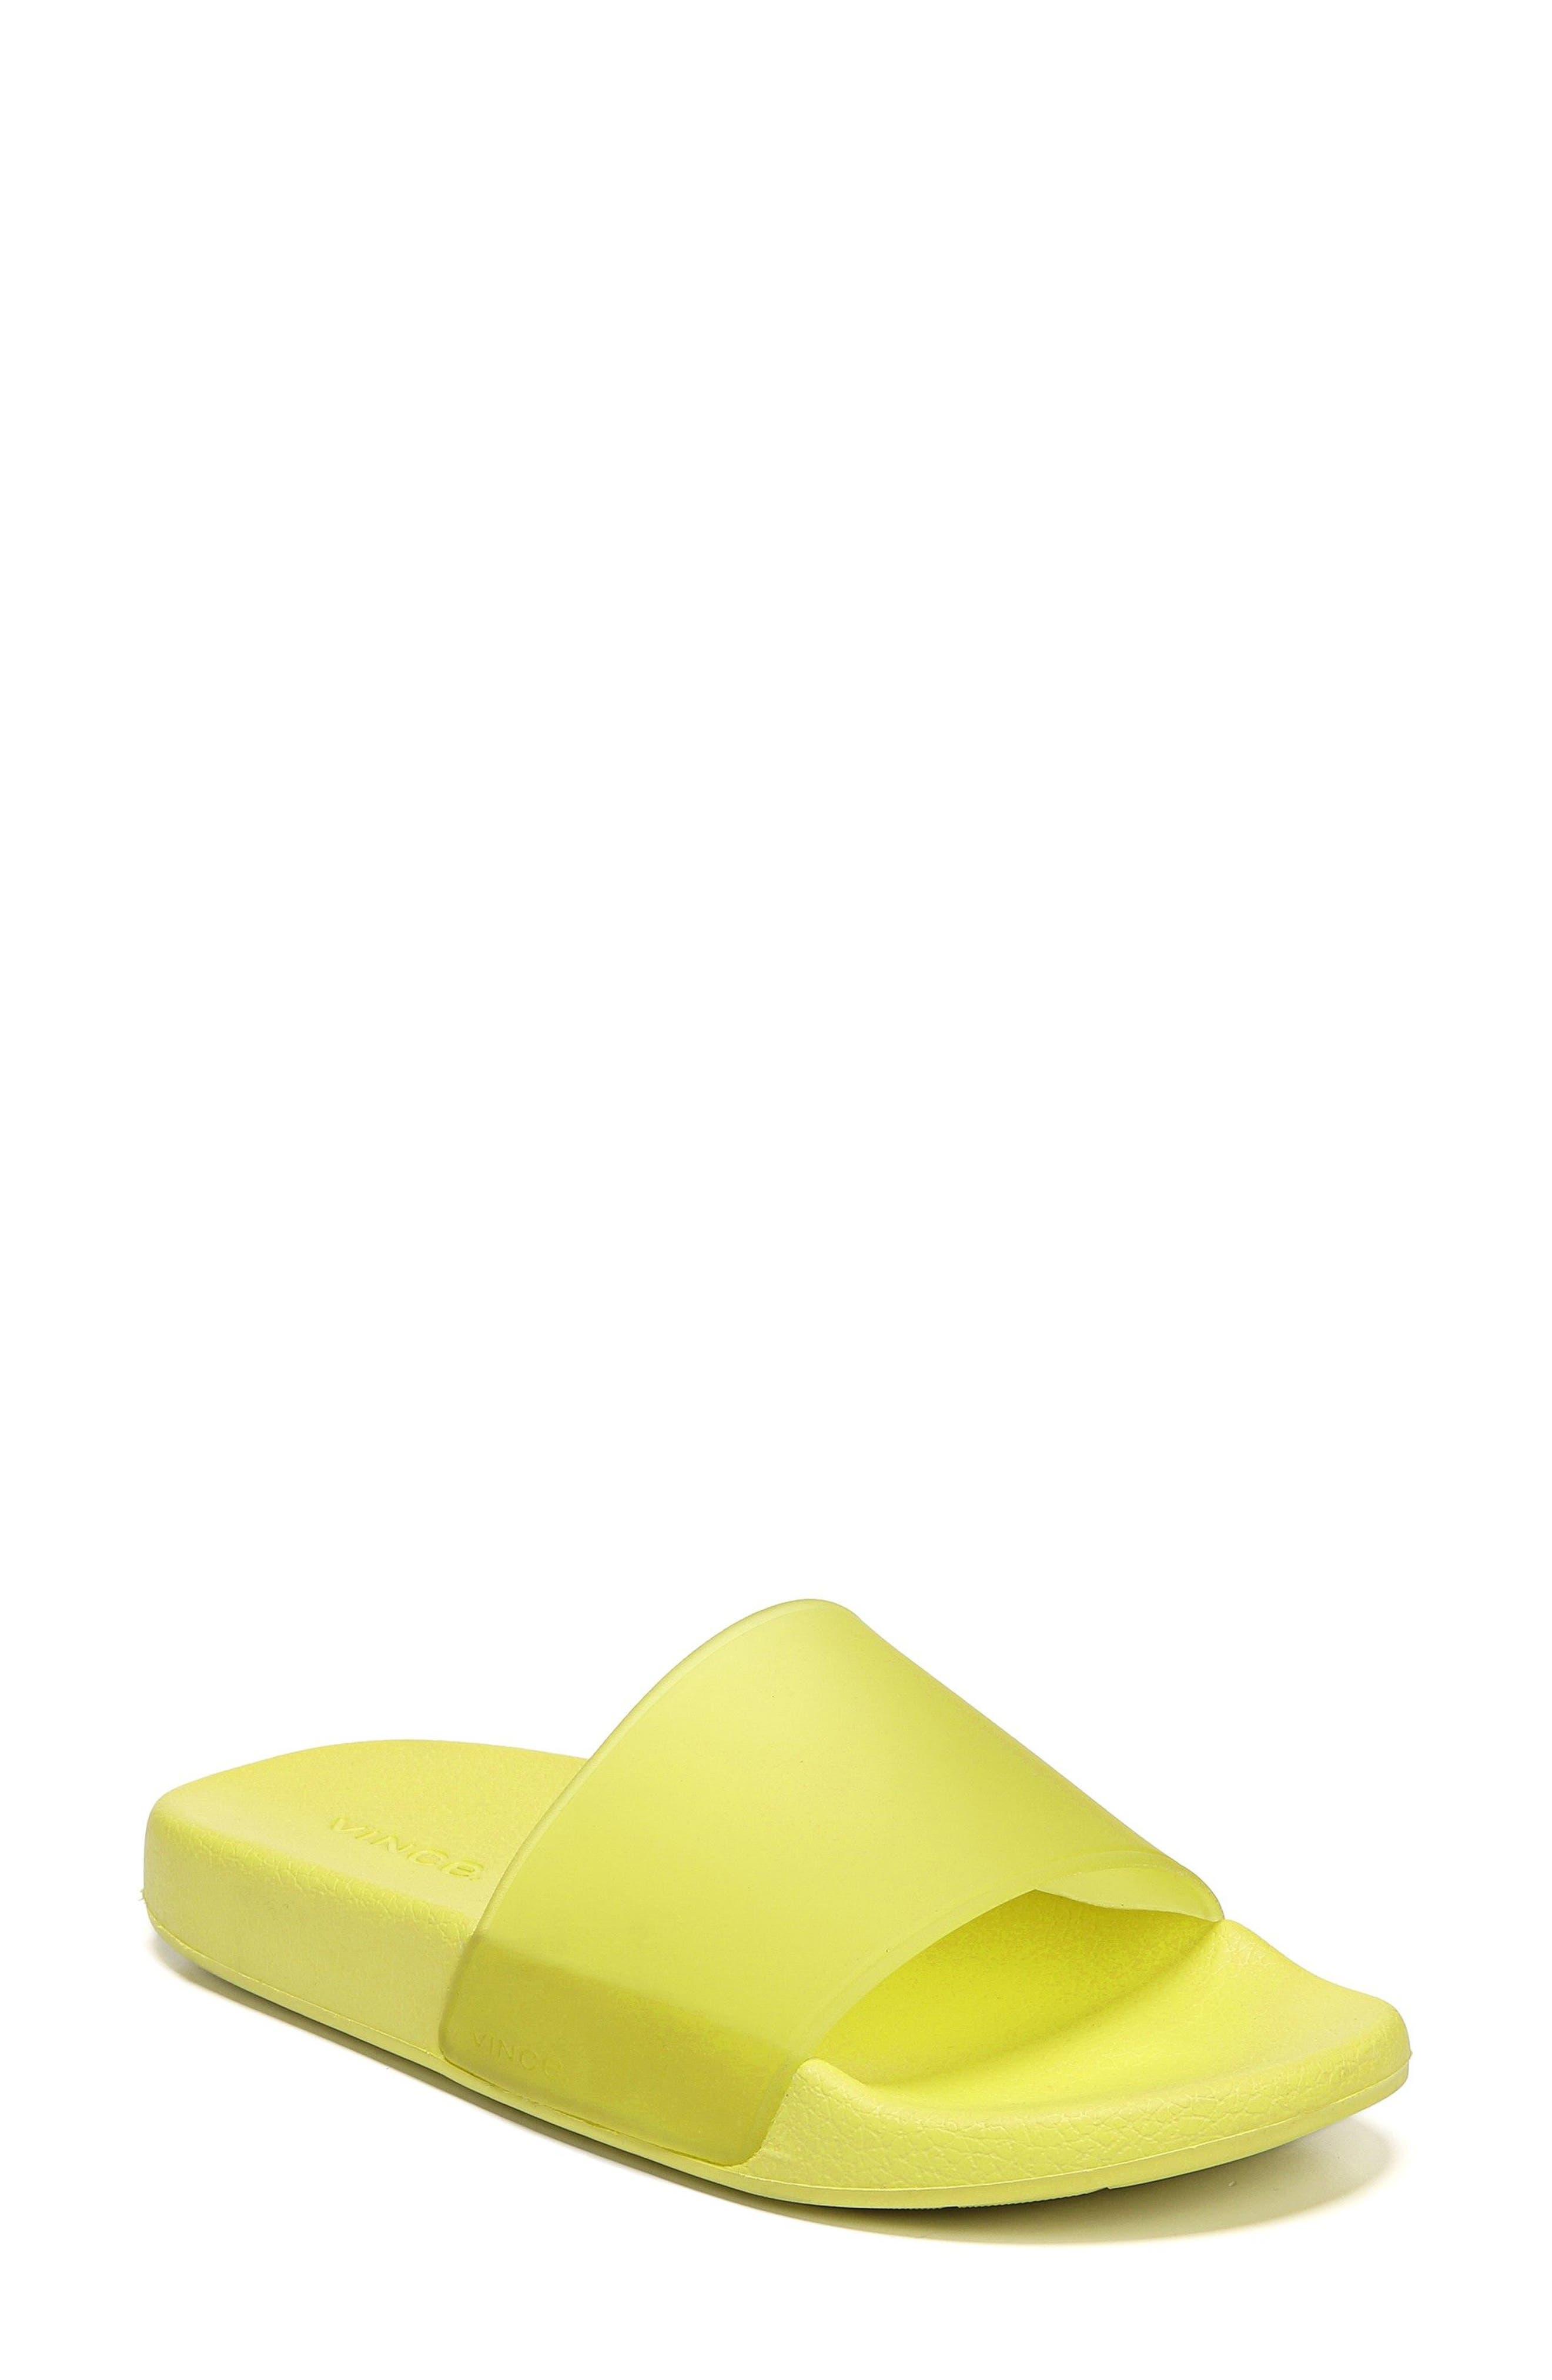 Westcoast Slide Sandal,                         Main,                         color, Citron